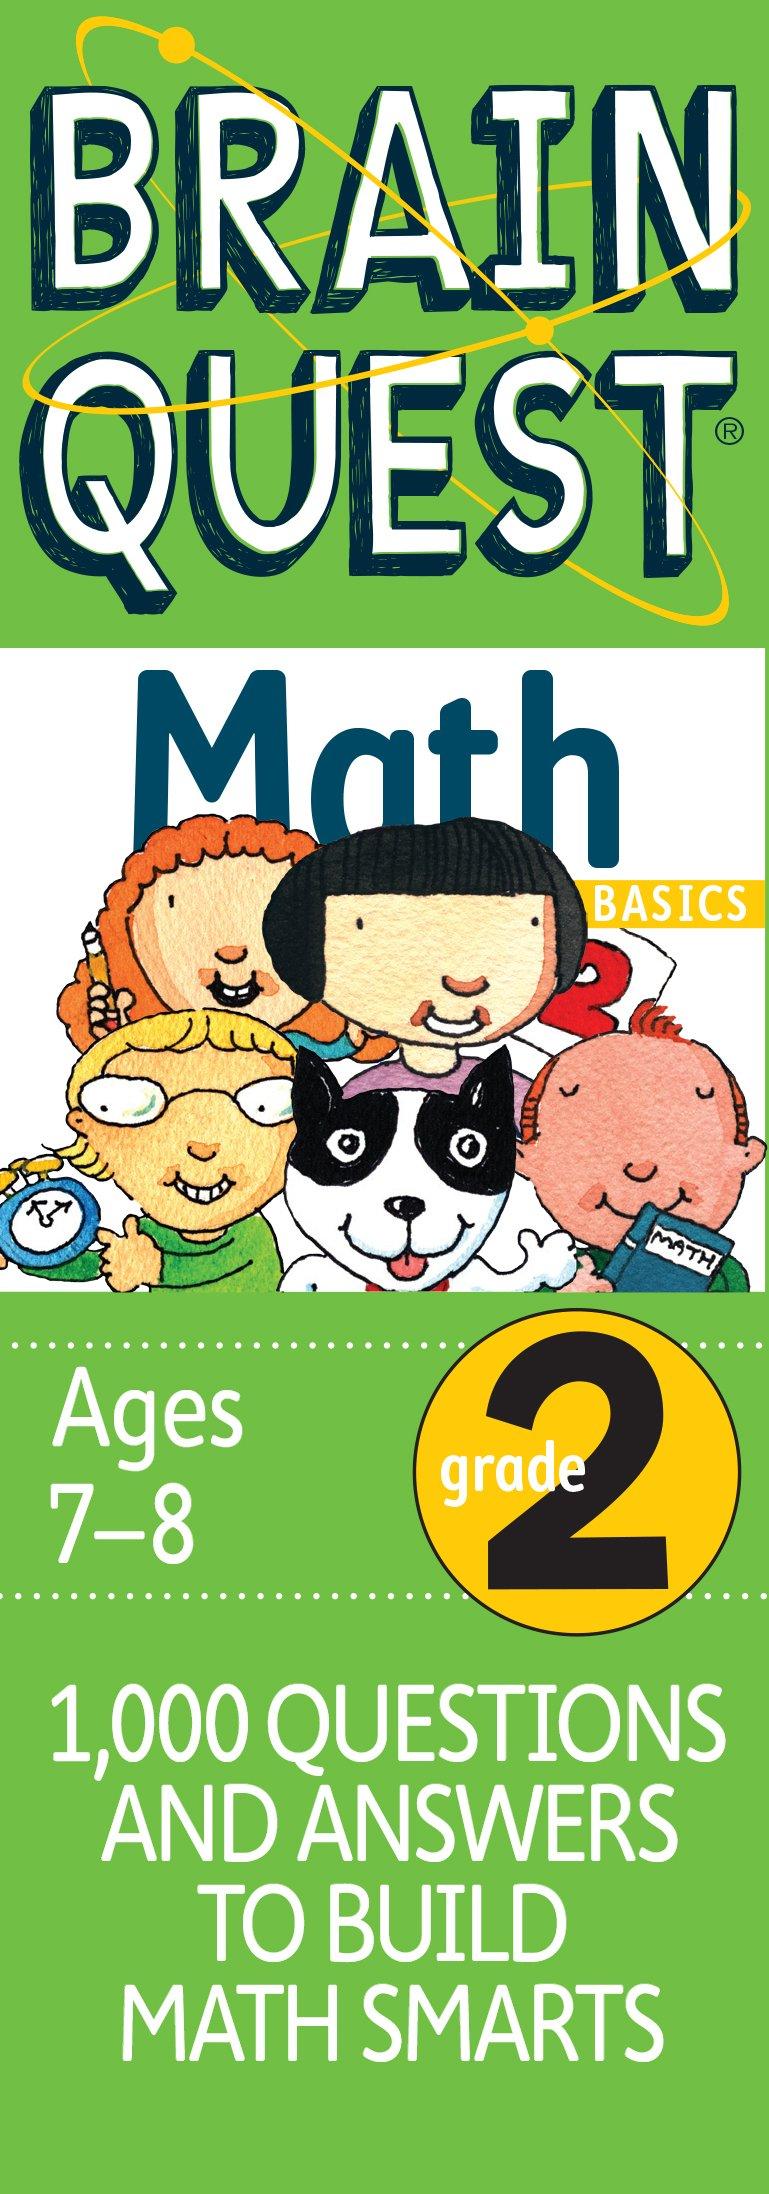 Brain Quest Grade 2 Math Cards – May 10 2006 Marjorie Martinelli Workman Publishing Company 0761141367 Mathematics - General